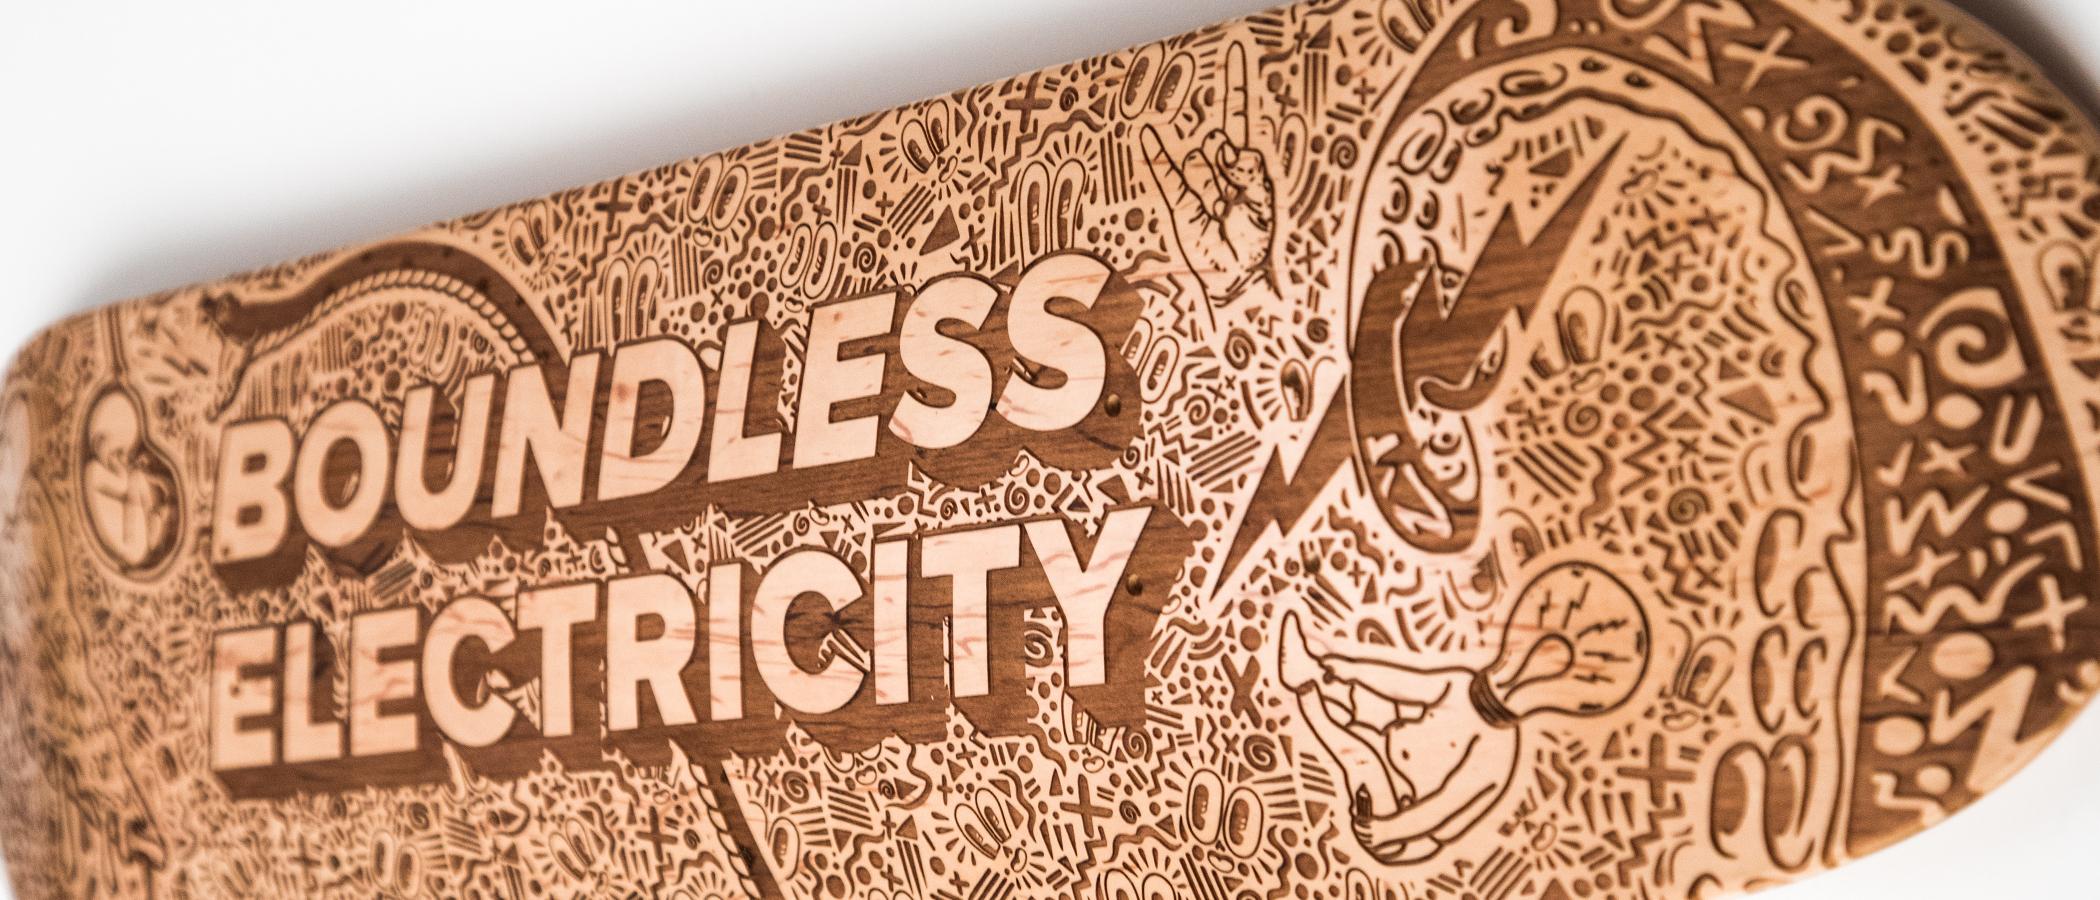 Boundless Electricity.jpg